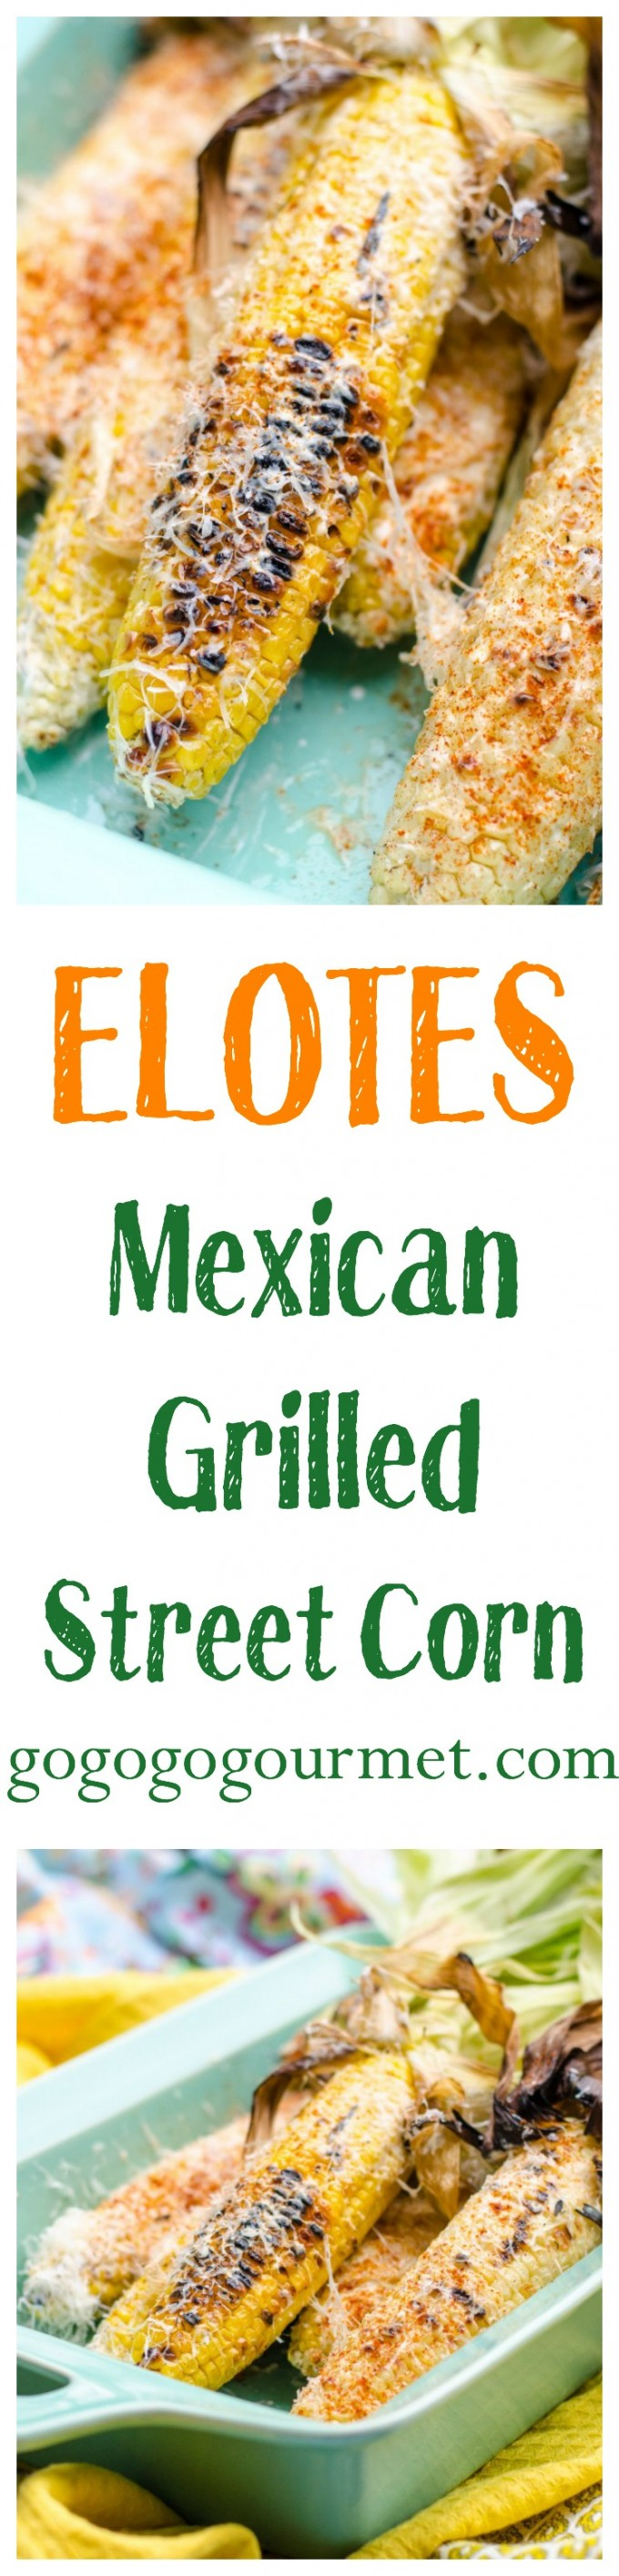 Mexican Grilled Corn (Elotes) Go Go Go Gourmet